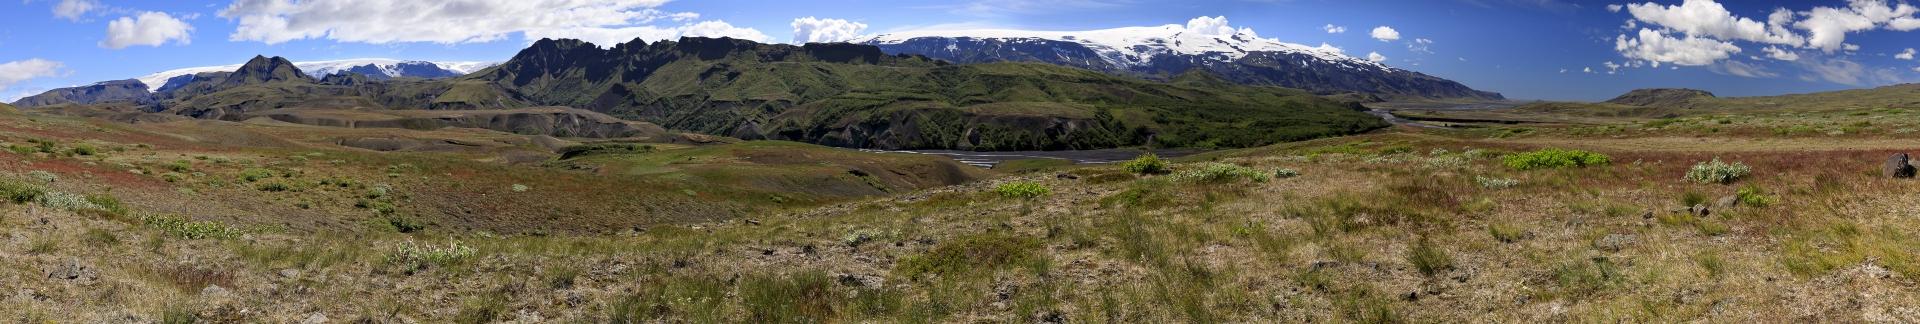 Mýrdalsjökull, Þórsmörk, Eyjafjallajökull Þröngá und Markarfljót